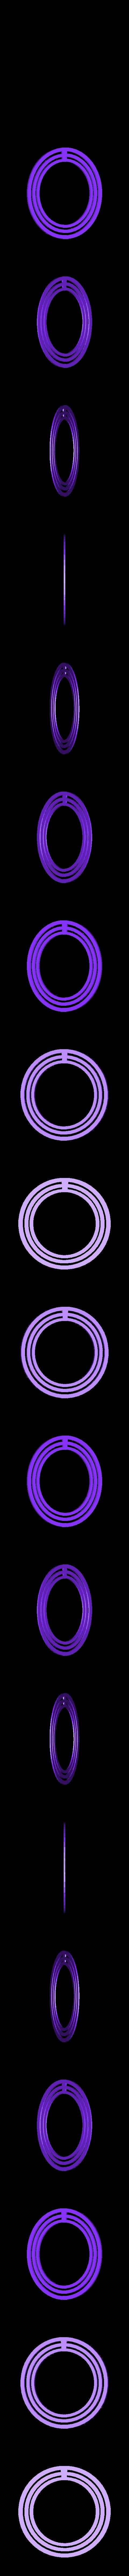 rings.stl Download free STL file Metropolis Robot (Maria) with Rings • 3D printer design, Girthnath